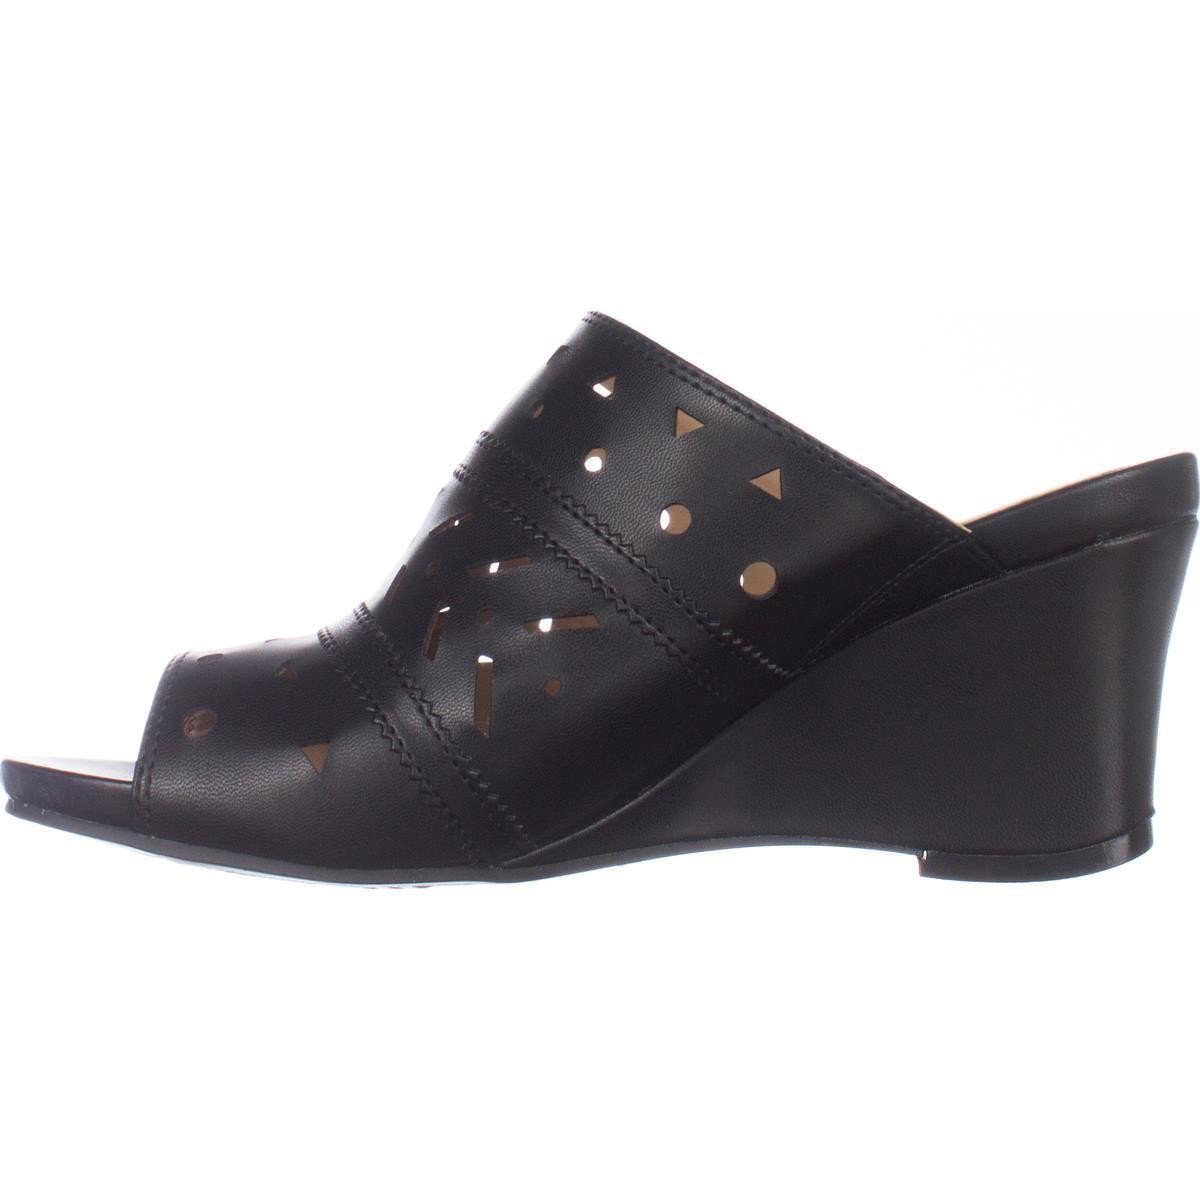 Naturalizer Womens Neha Open Toe Mules Black Size 10.0